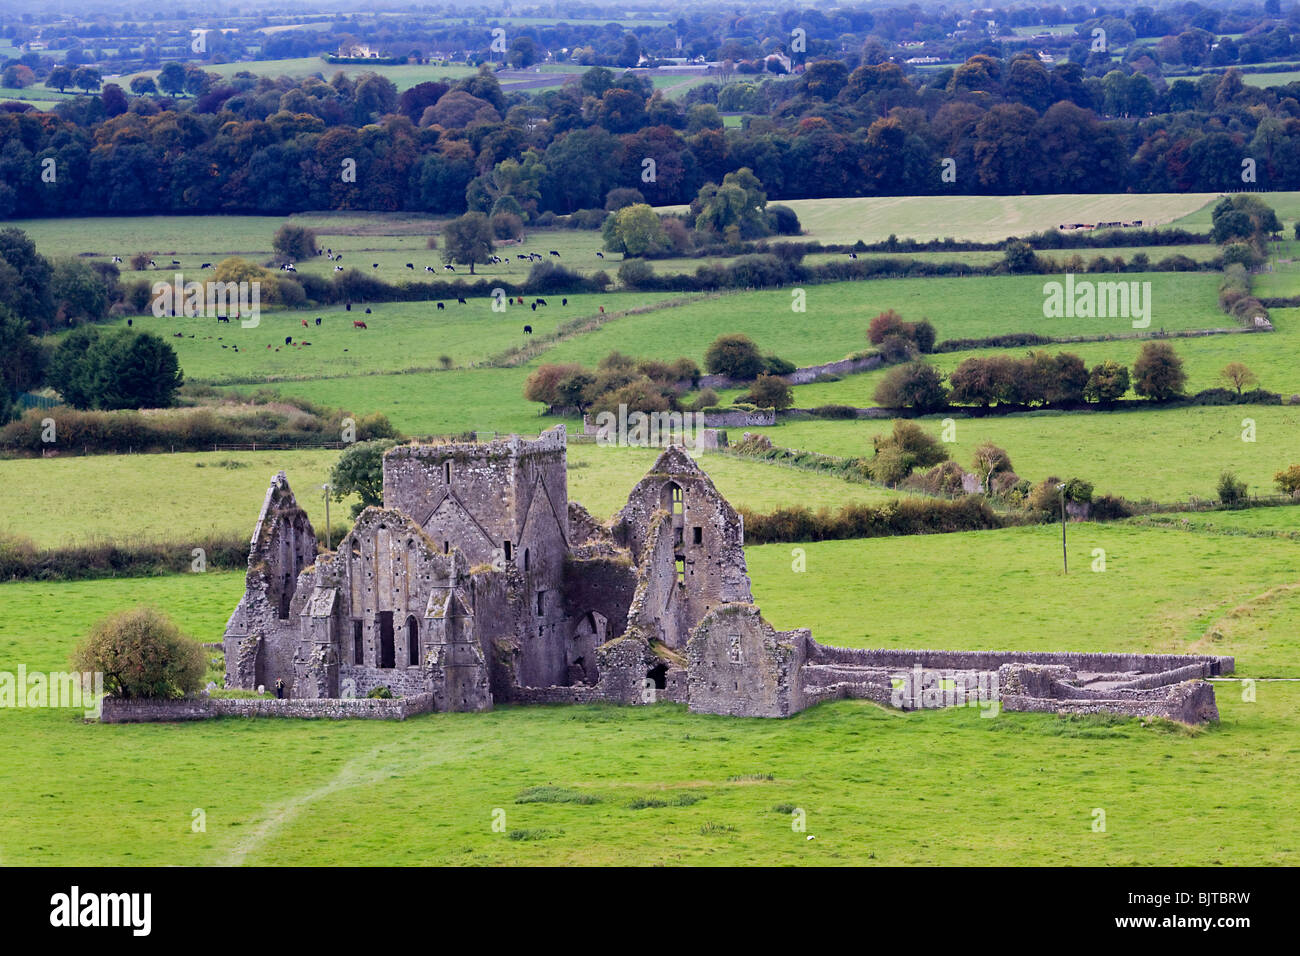 Cashel priory abbey Tipperary Ireland - Stock Image